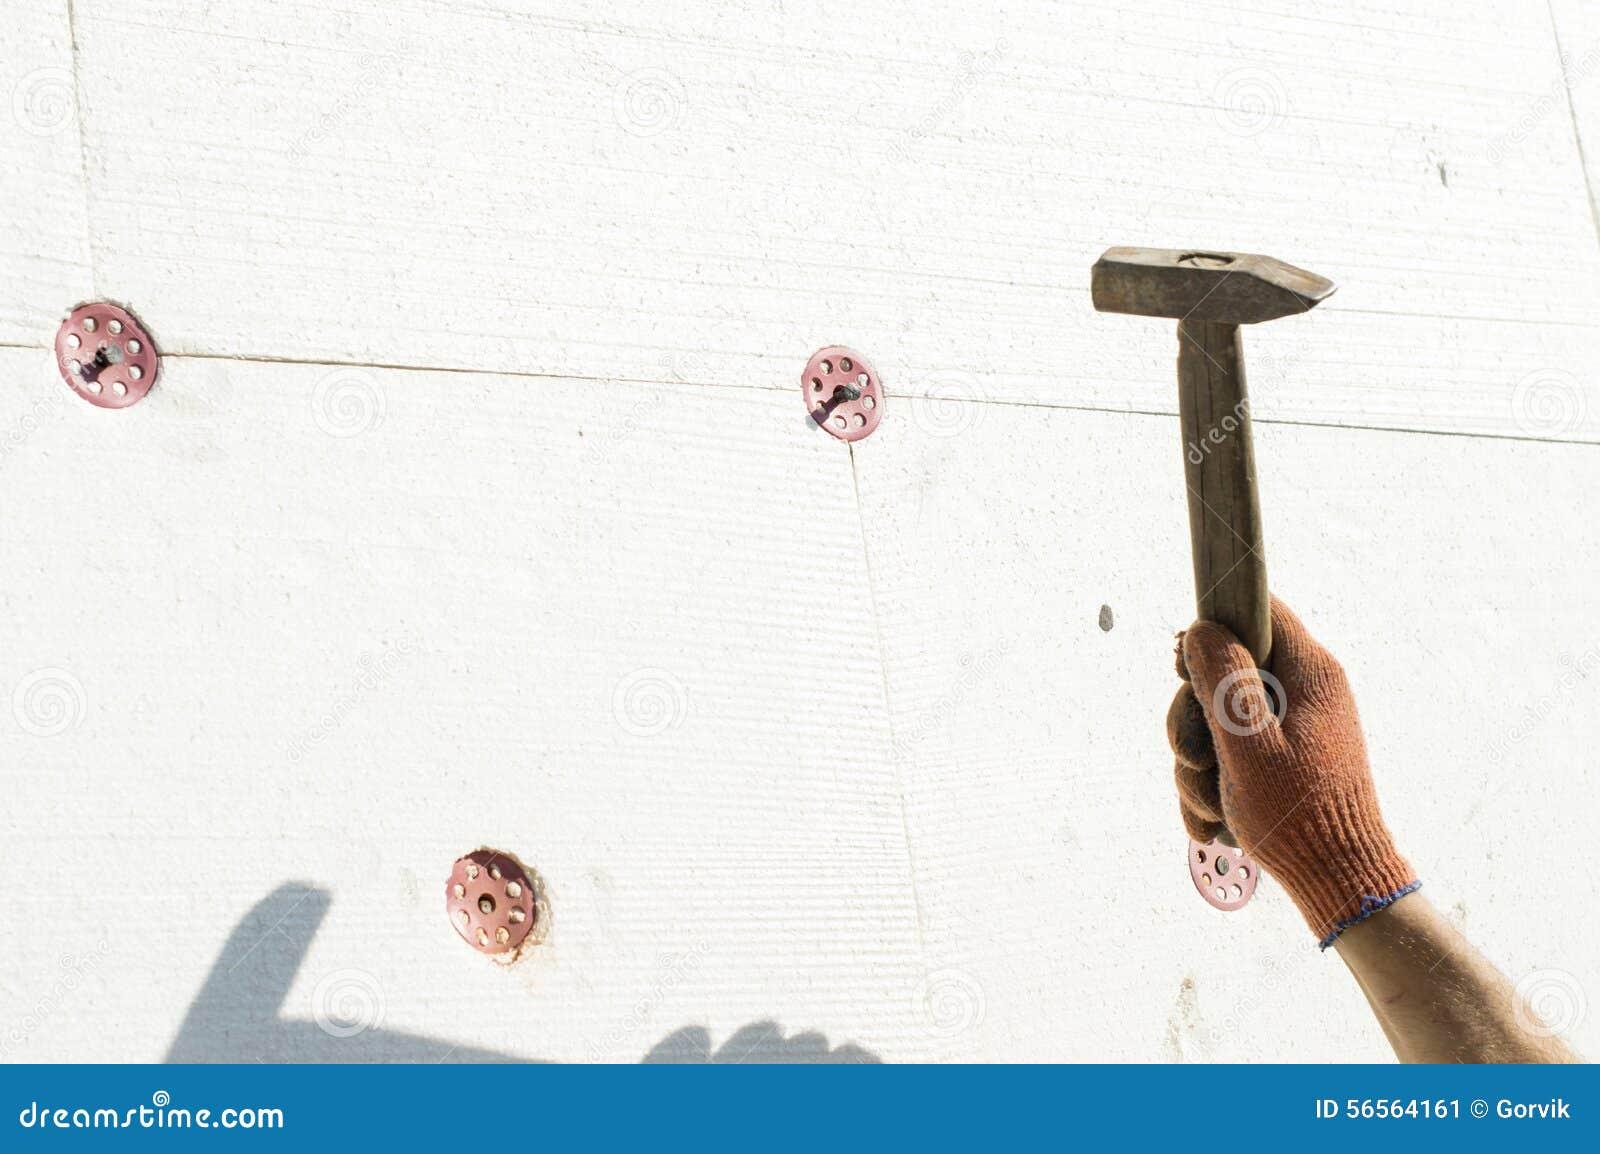 Download Η διαδικασία χρησιμοποιώντας ένα σφυρί μετάλλων Στοκ Εικόνα - εικόνα από κύριος, πλάνο: 56564161